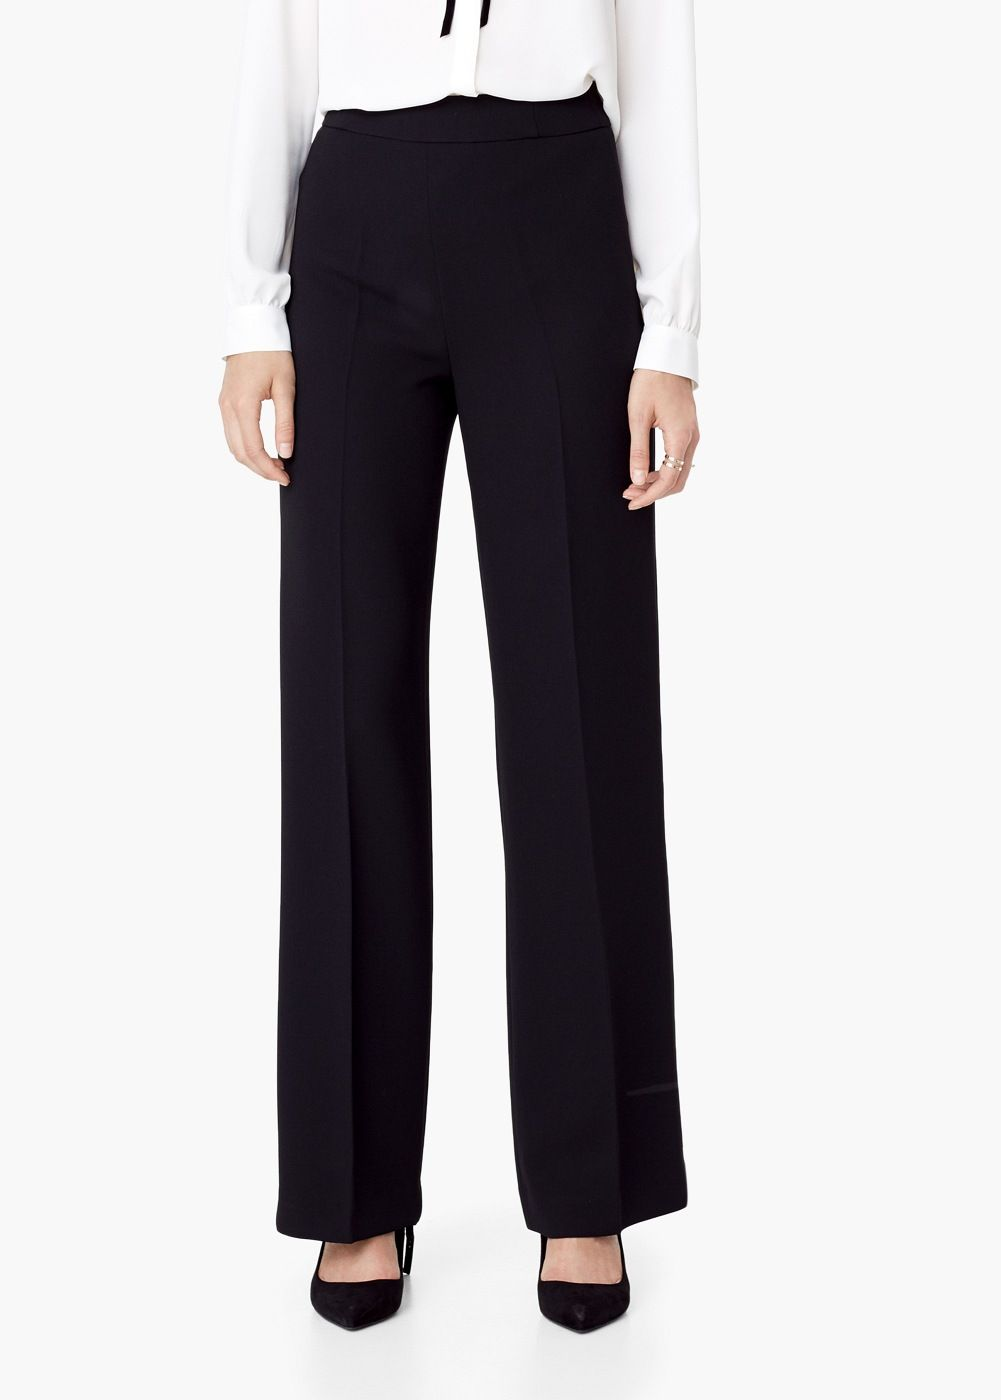 Pantalon taille haute - Femme   whish list shopping f5445ed60af